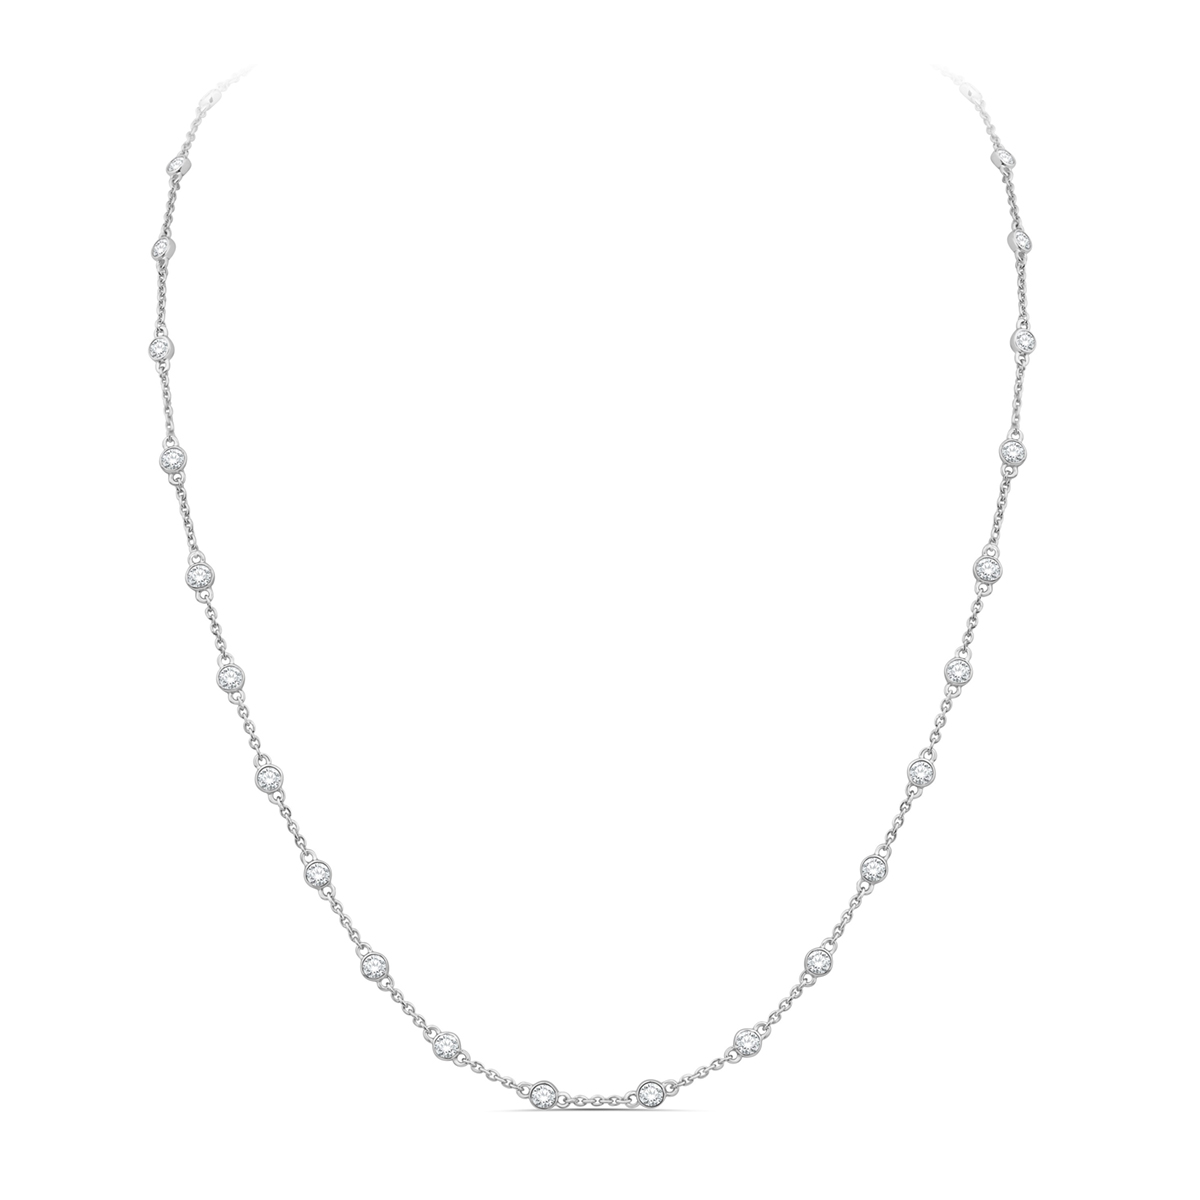 Paramount Gems 14 Karat White Gold 1 Carat Diamond By the Yard Necklace